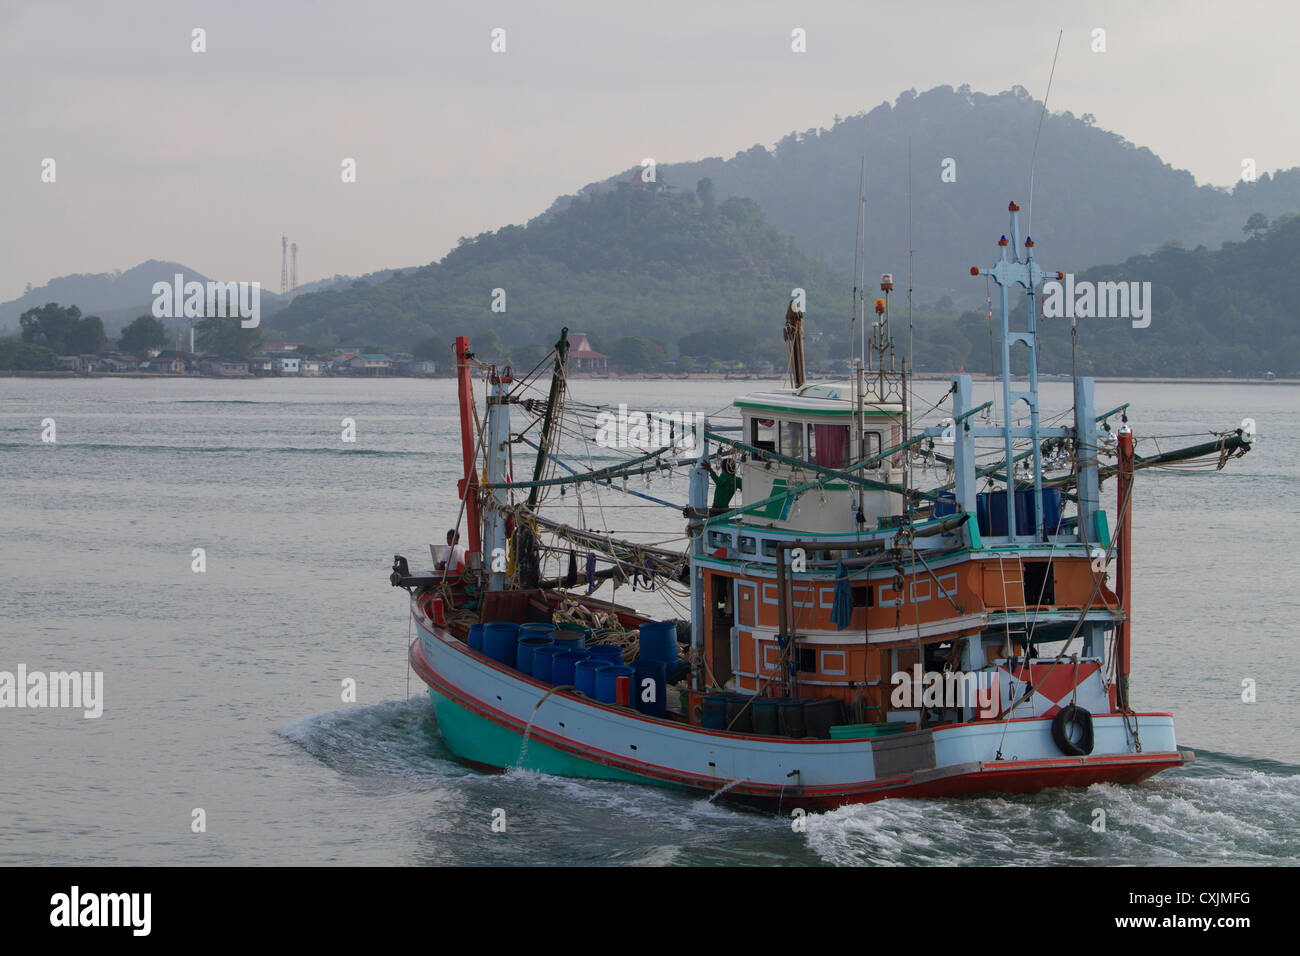 Fishing Boat returning to the Port - Stock Image